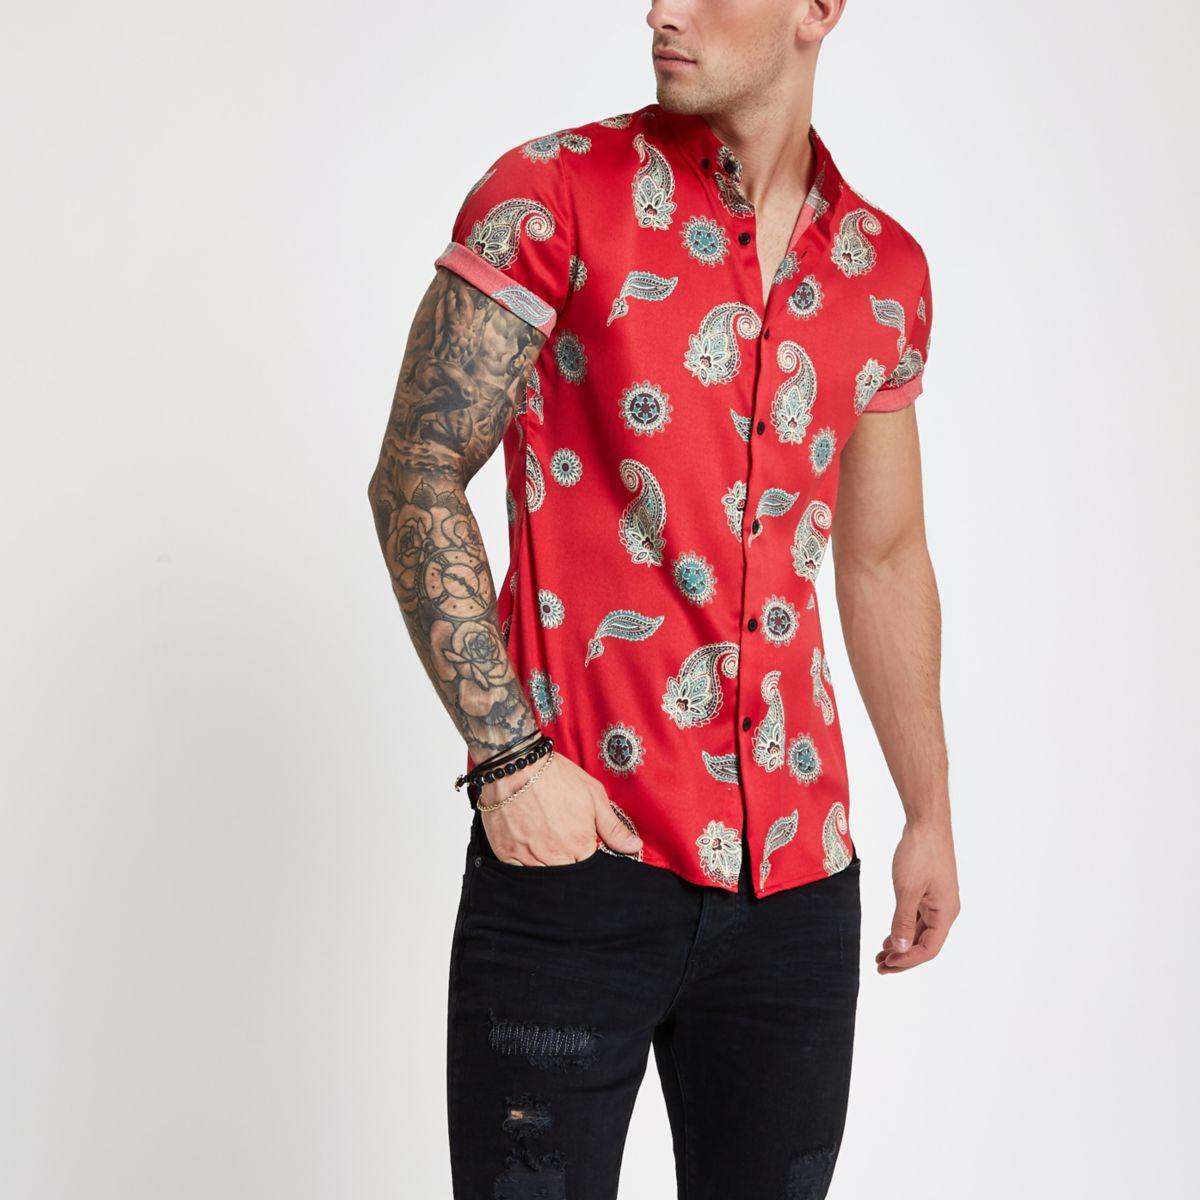 Mens Burgundy paisley slim fit short sleeve shirt River Island Pre Order Cheap Price Discount Fashionable qISQAG